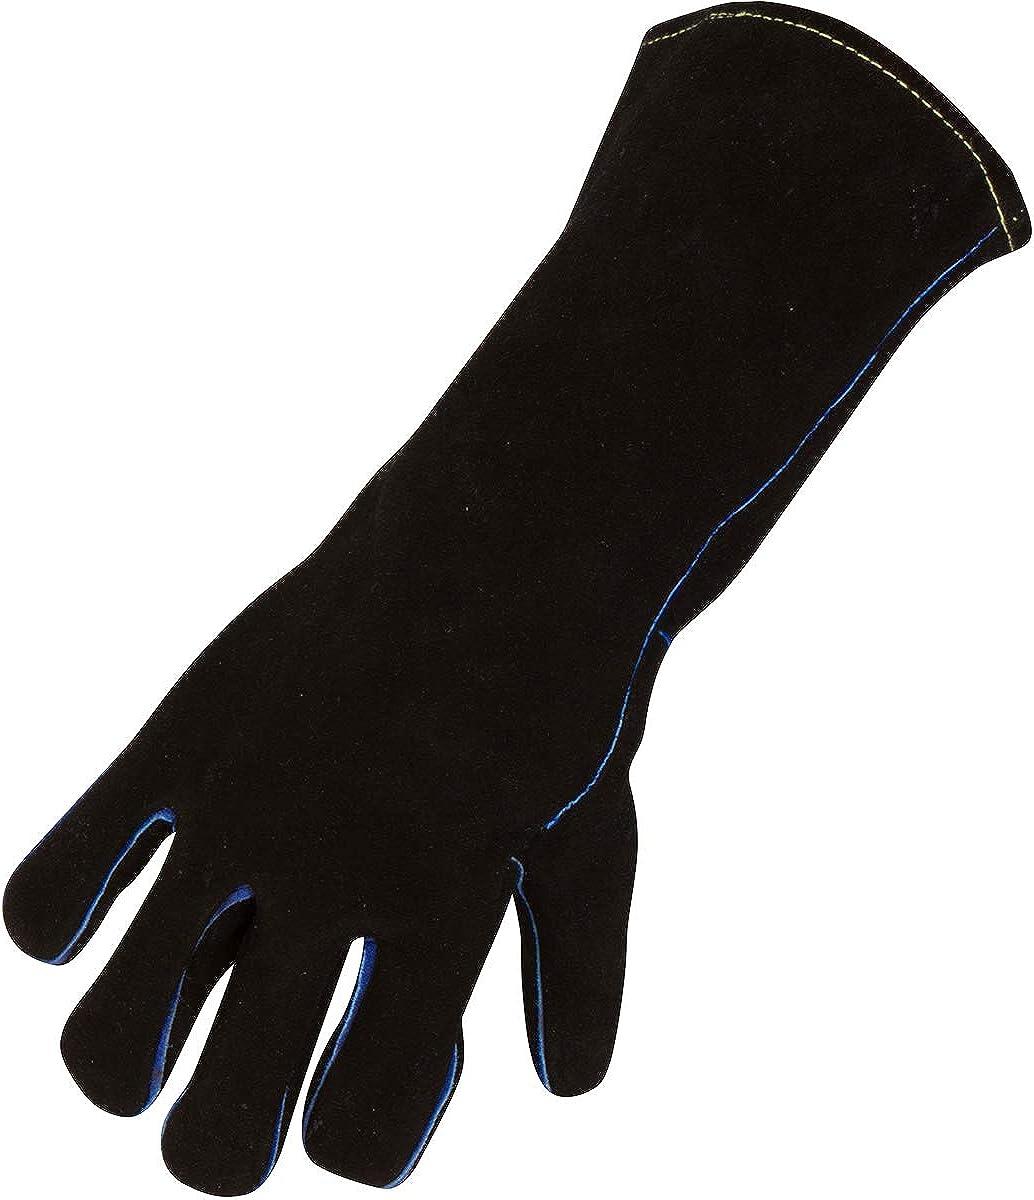 Welding Gloves in Sizes for Men Women Teens W Ranking TOP9 Super sale period limited Stick XXL to Sm